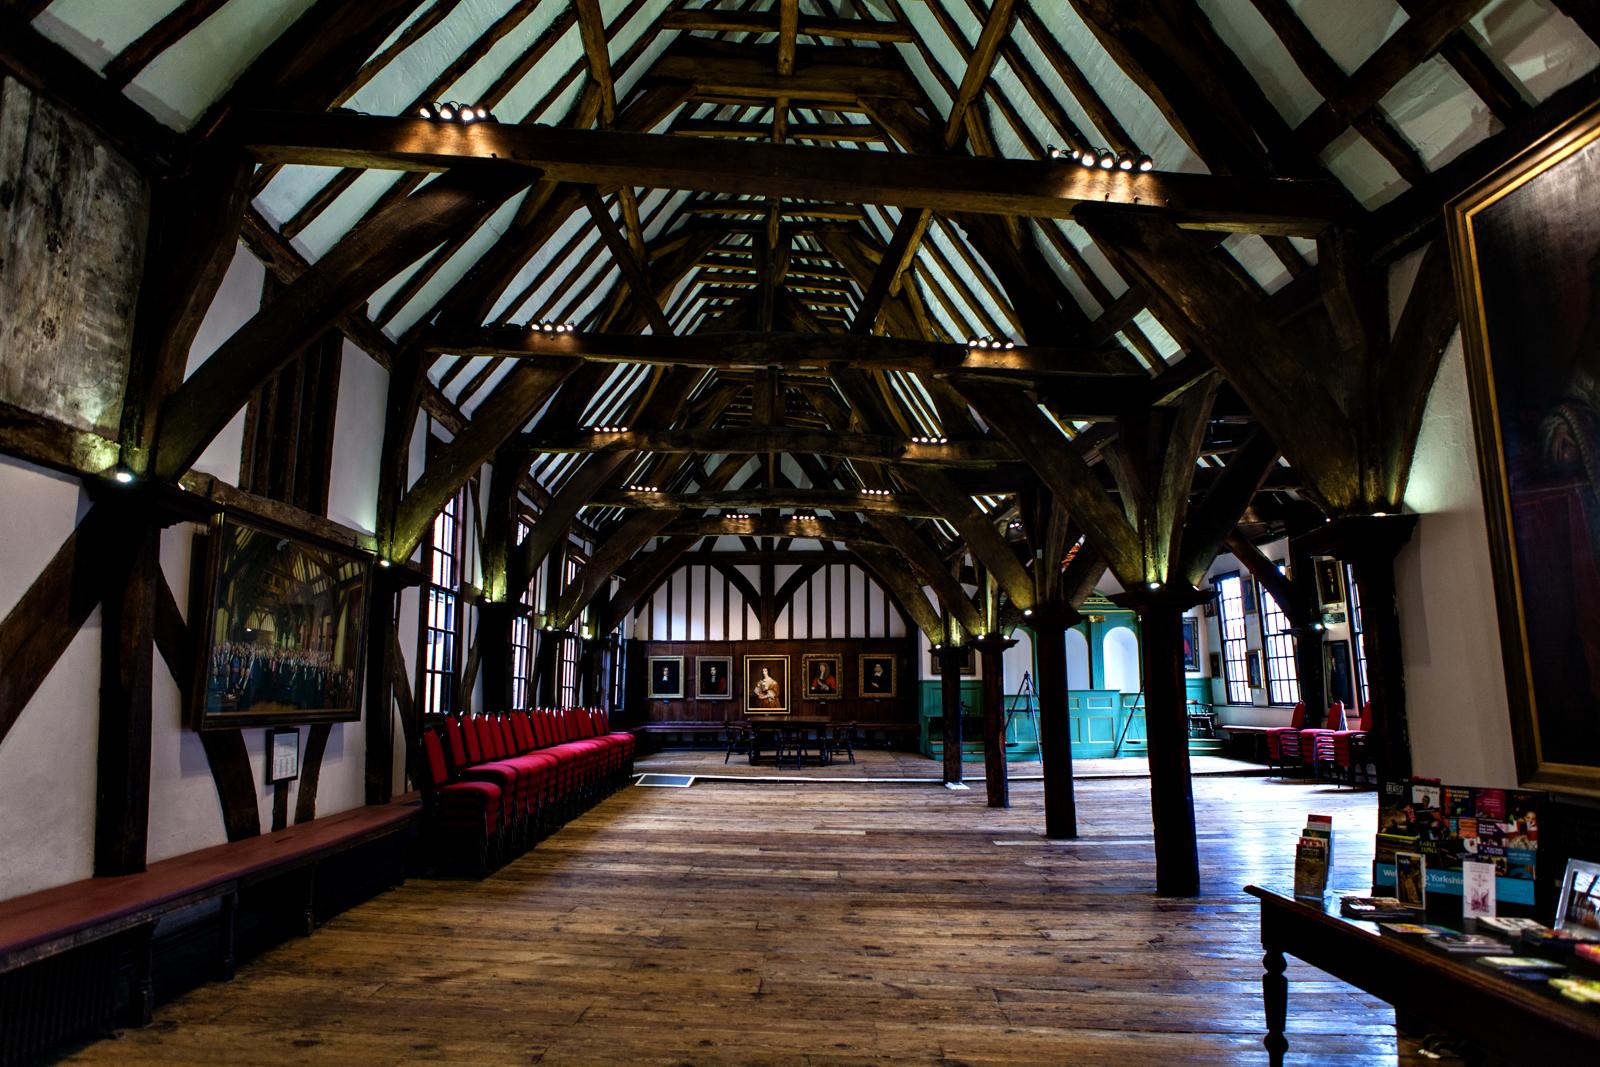 ©Jennifer Bailey 2013 Merchant Adventurer's Hall, York, England